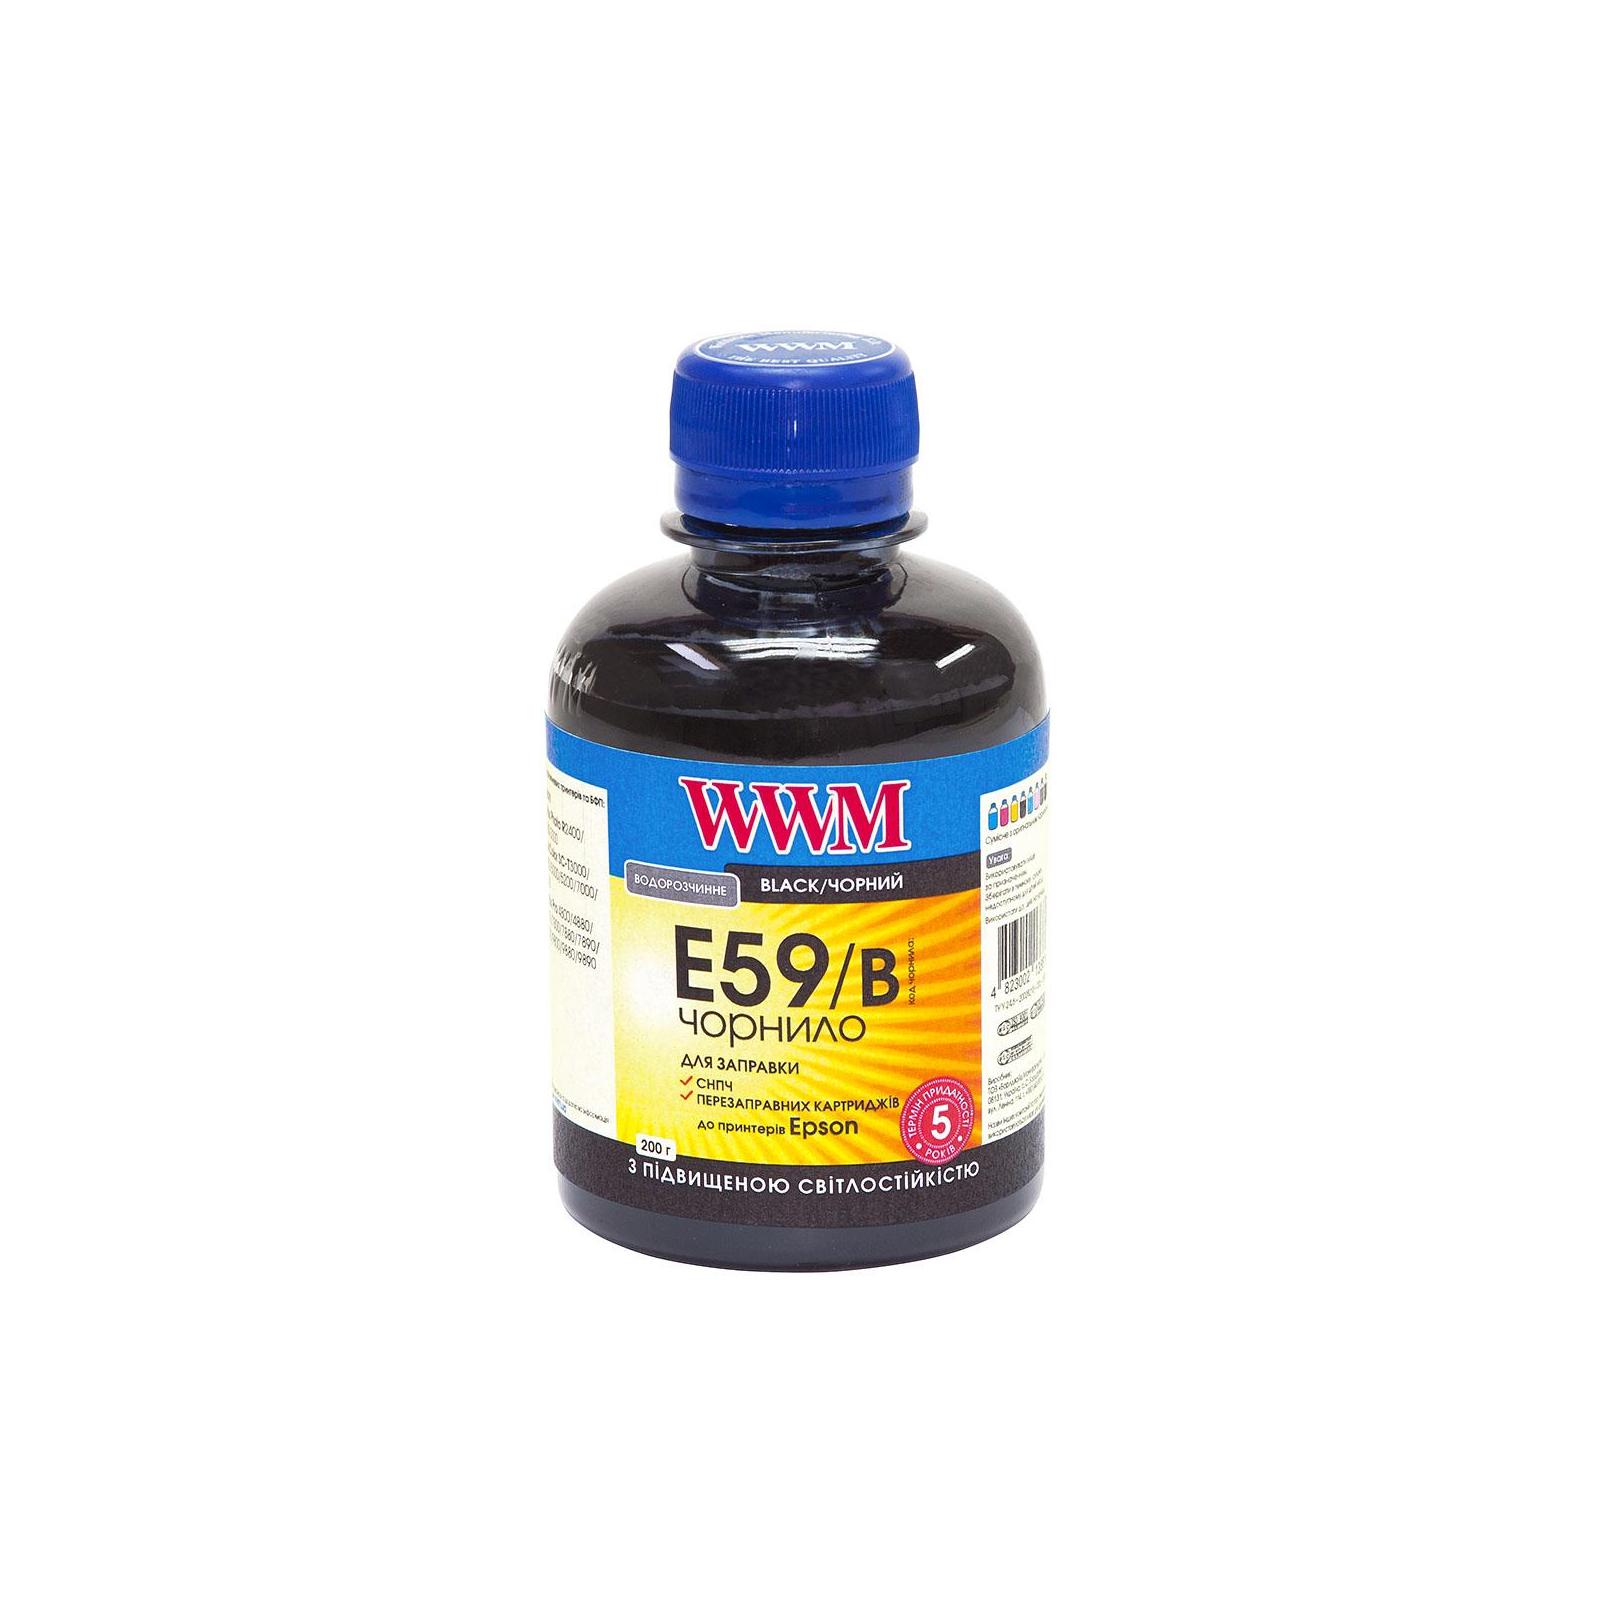 Чернила WWM EPSON StPro 7700/9700//R2400 Black (E59/B)